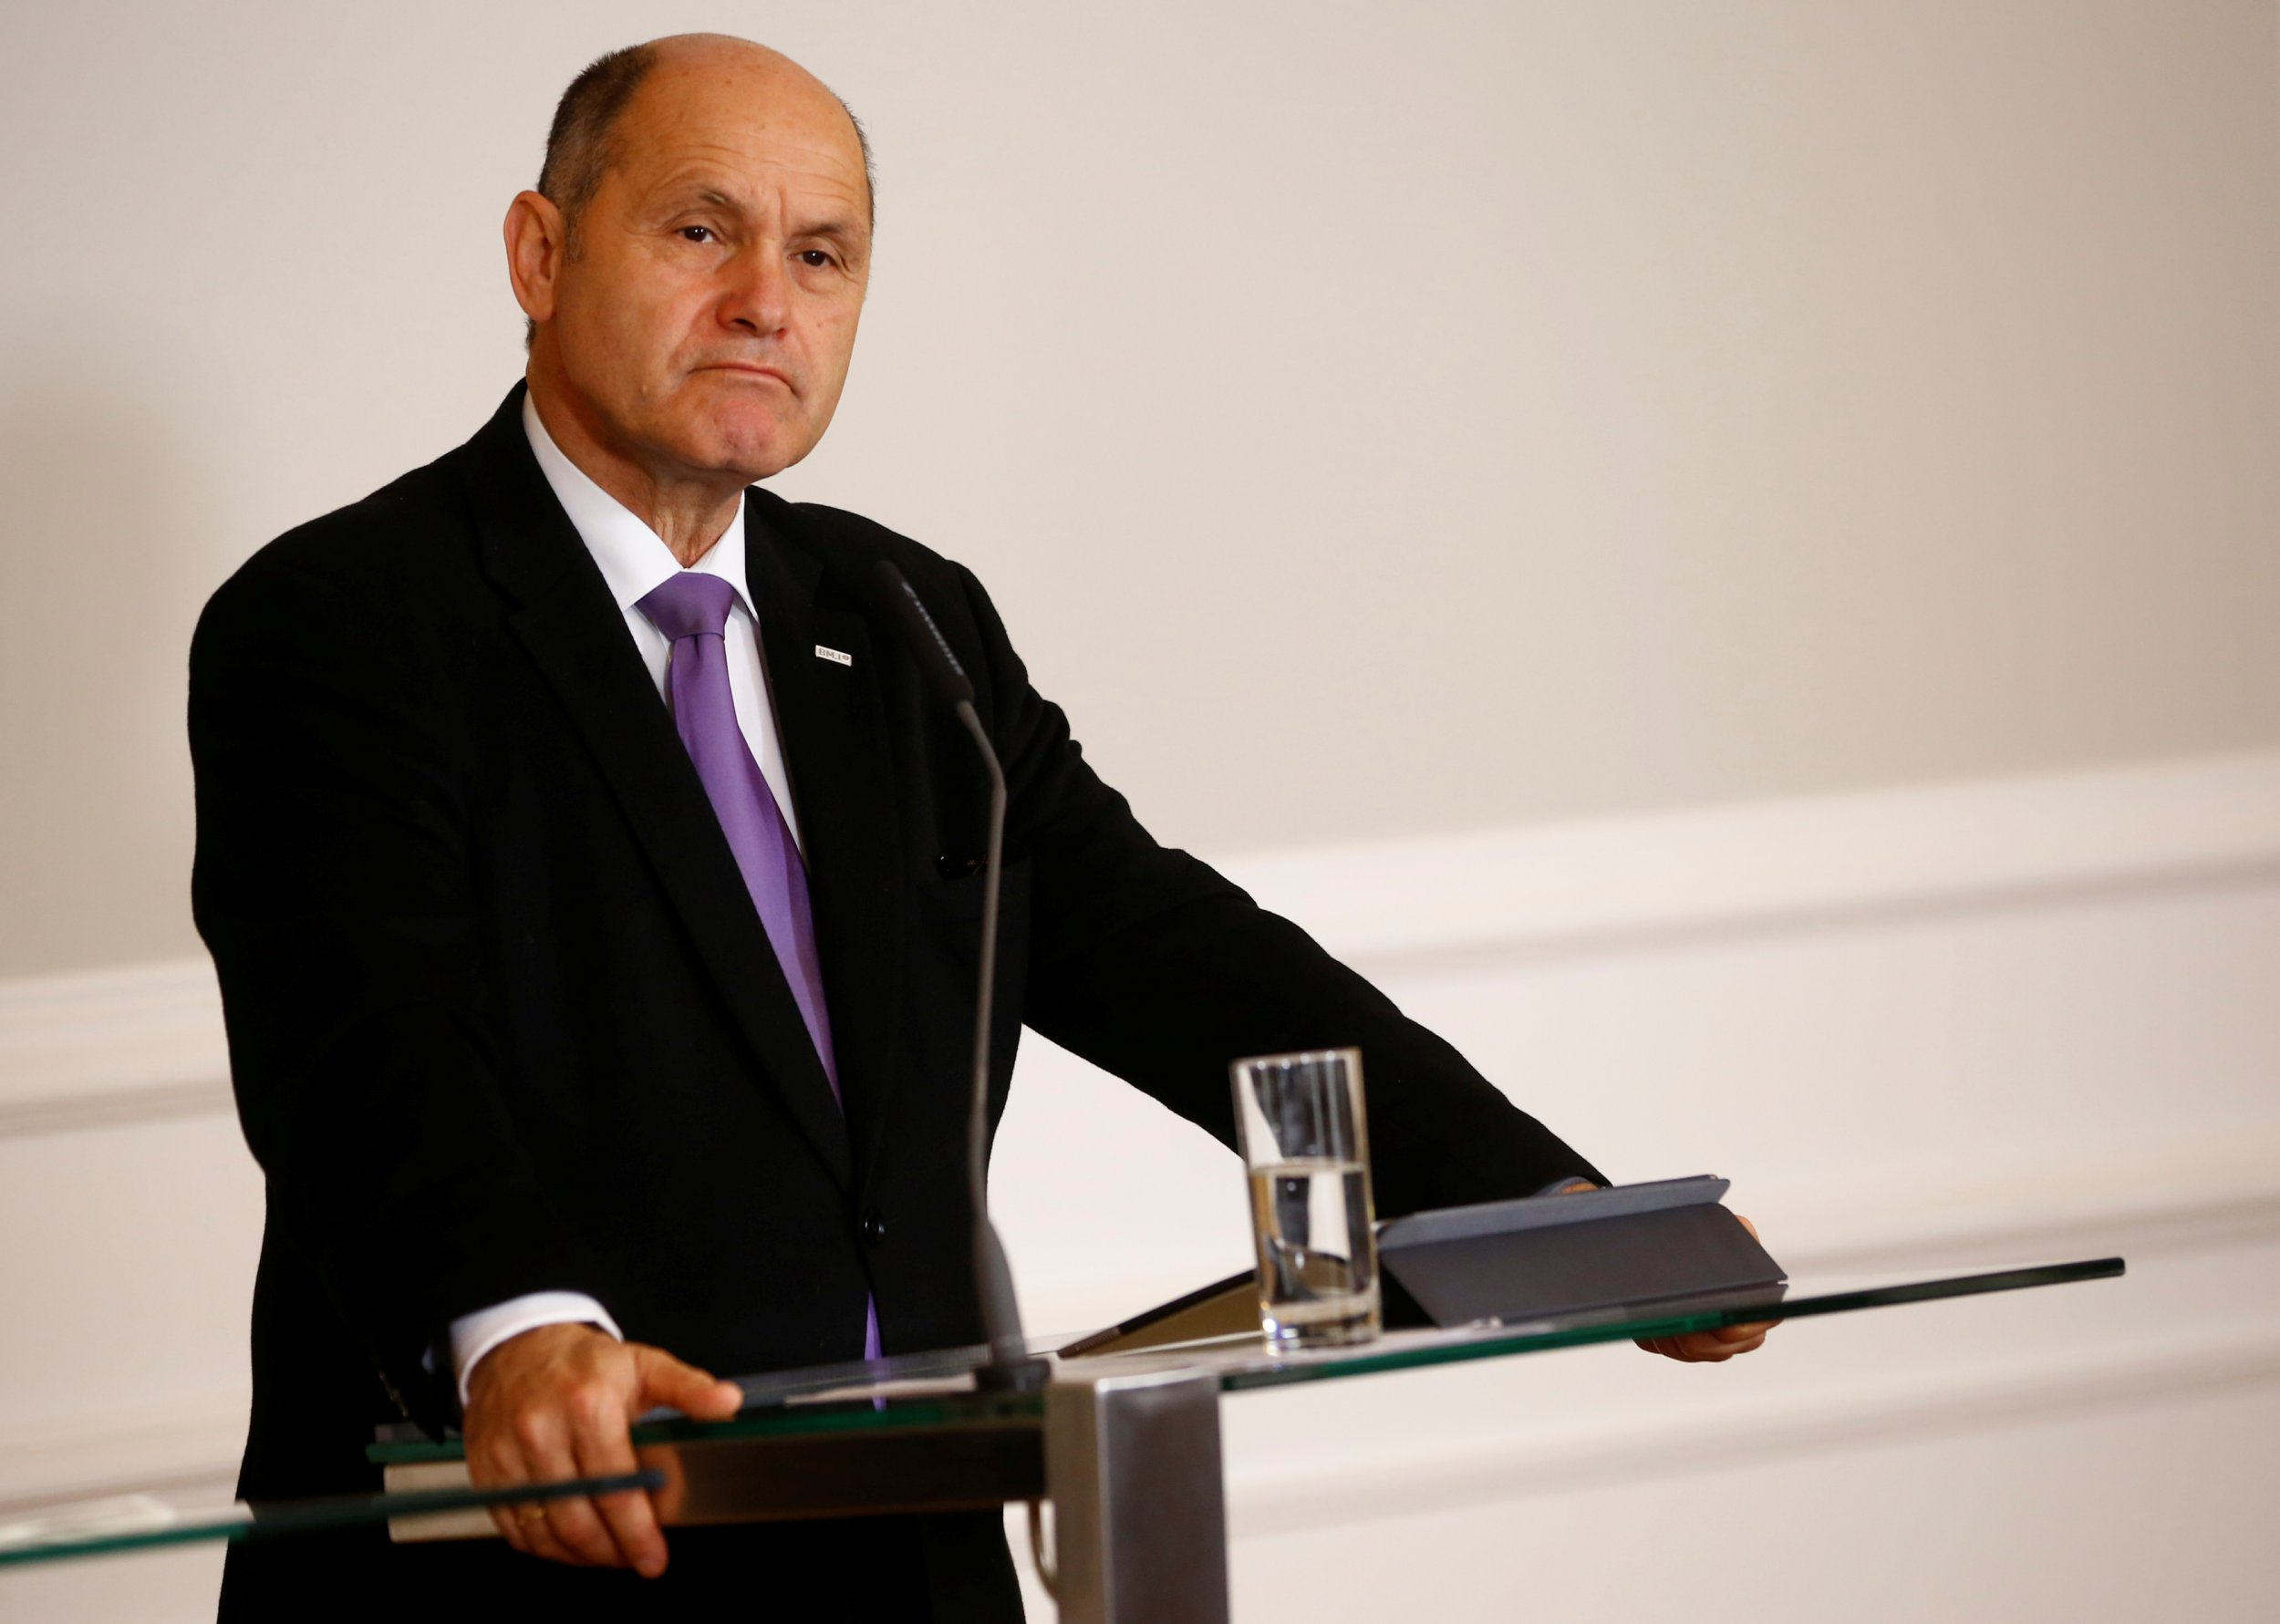 Austria's Interior Minister Wolfgang Sobotka